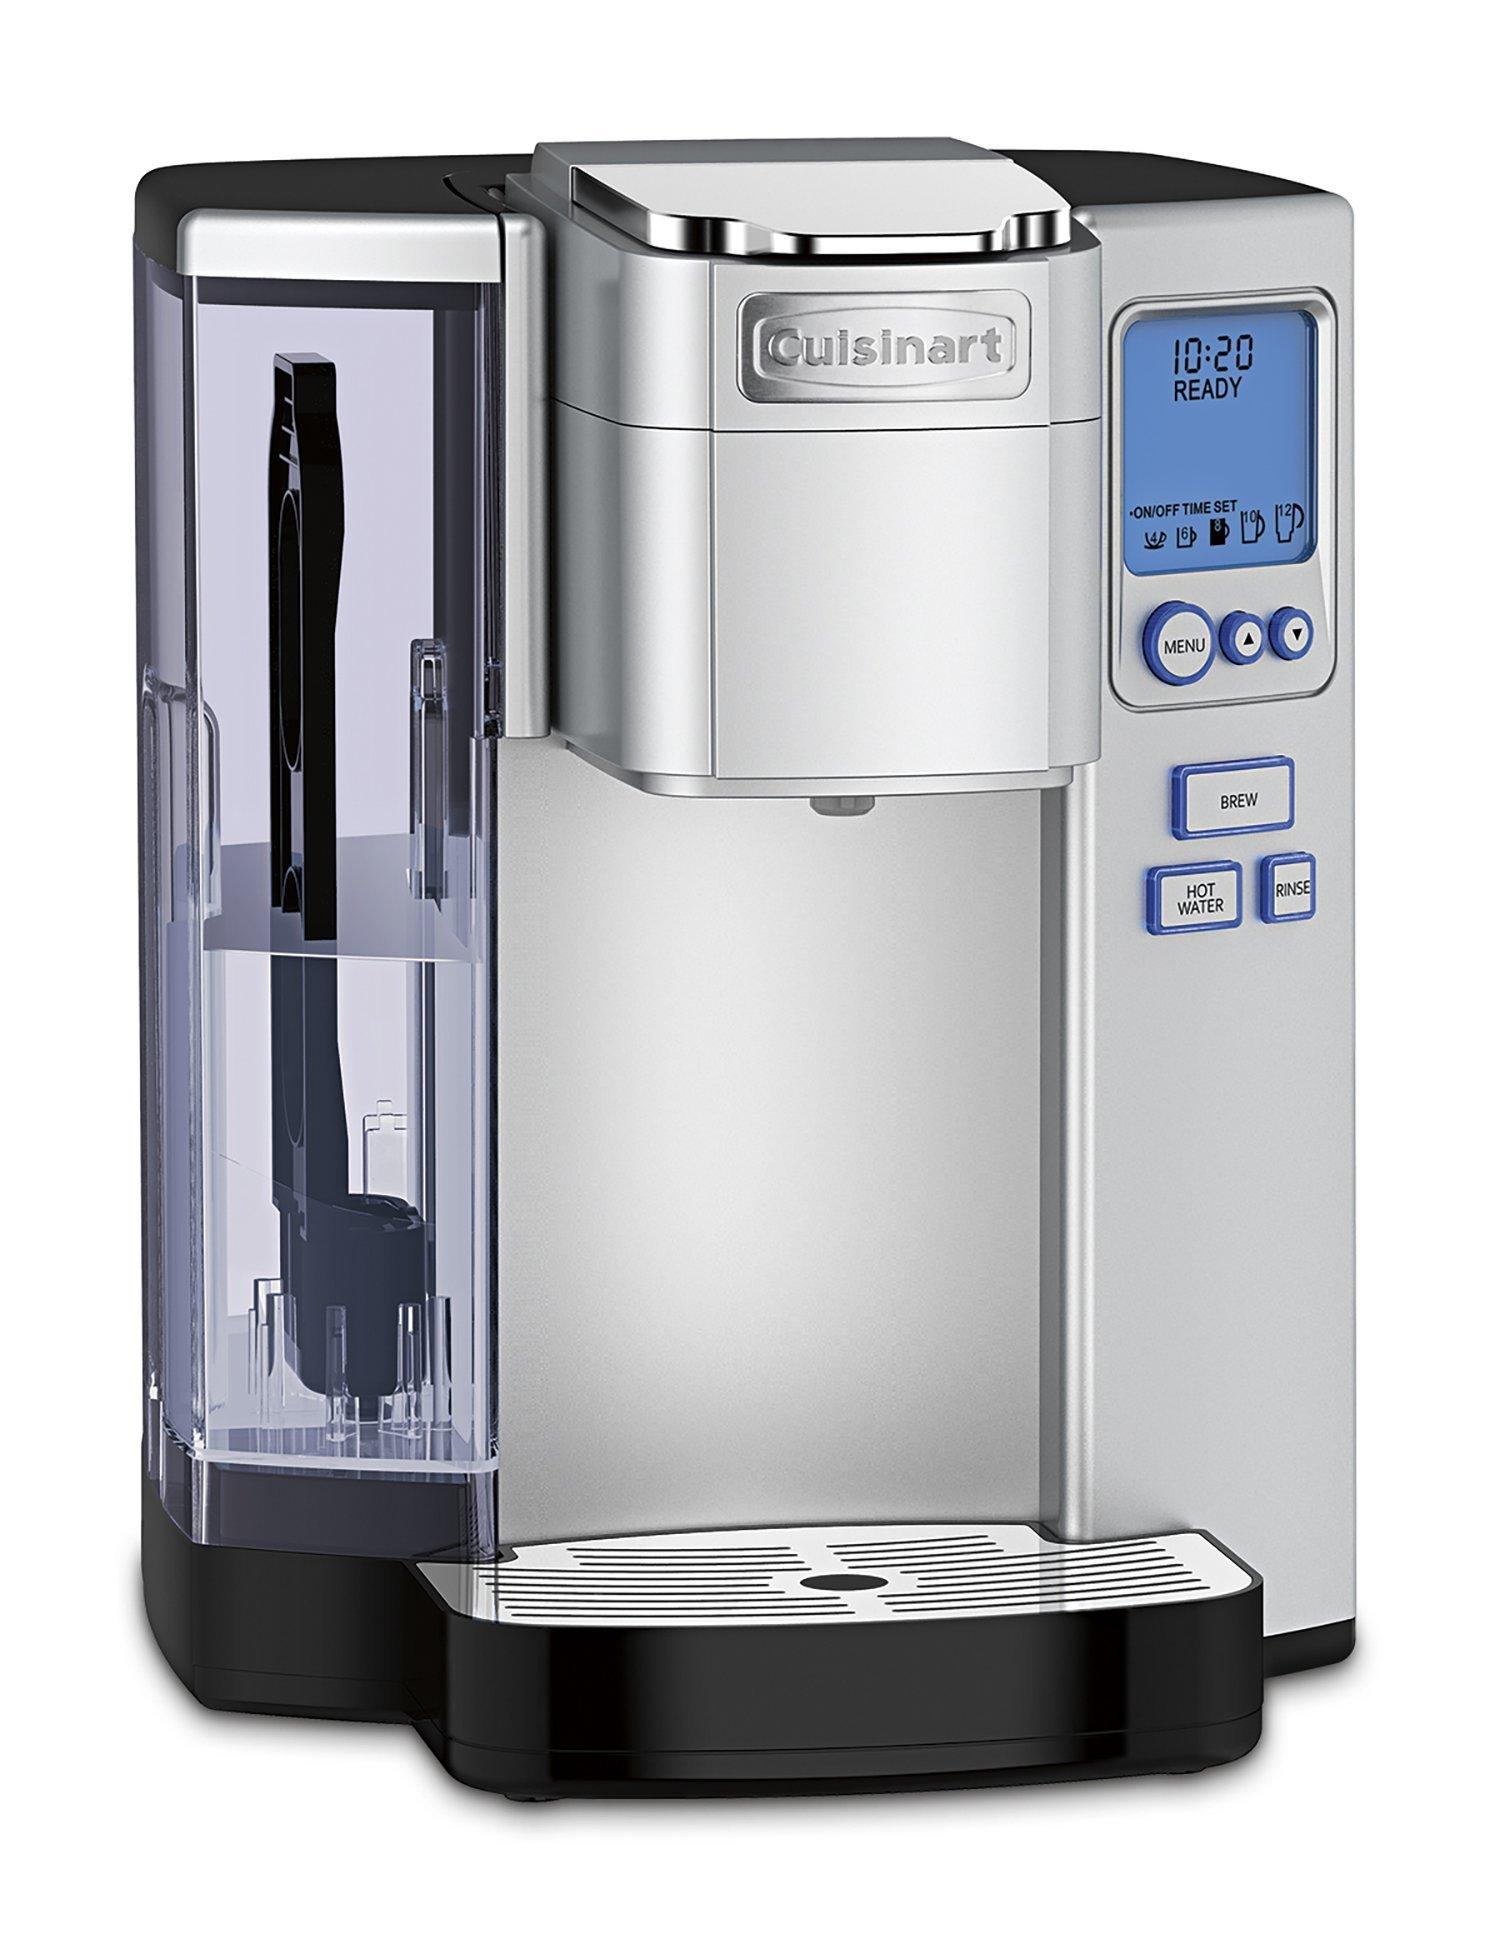 Cuisinart SS-10 Premium Single-Serve Coffeemaker, Silver by Cuisinart